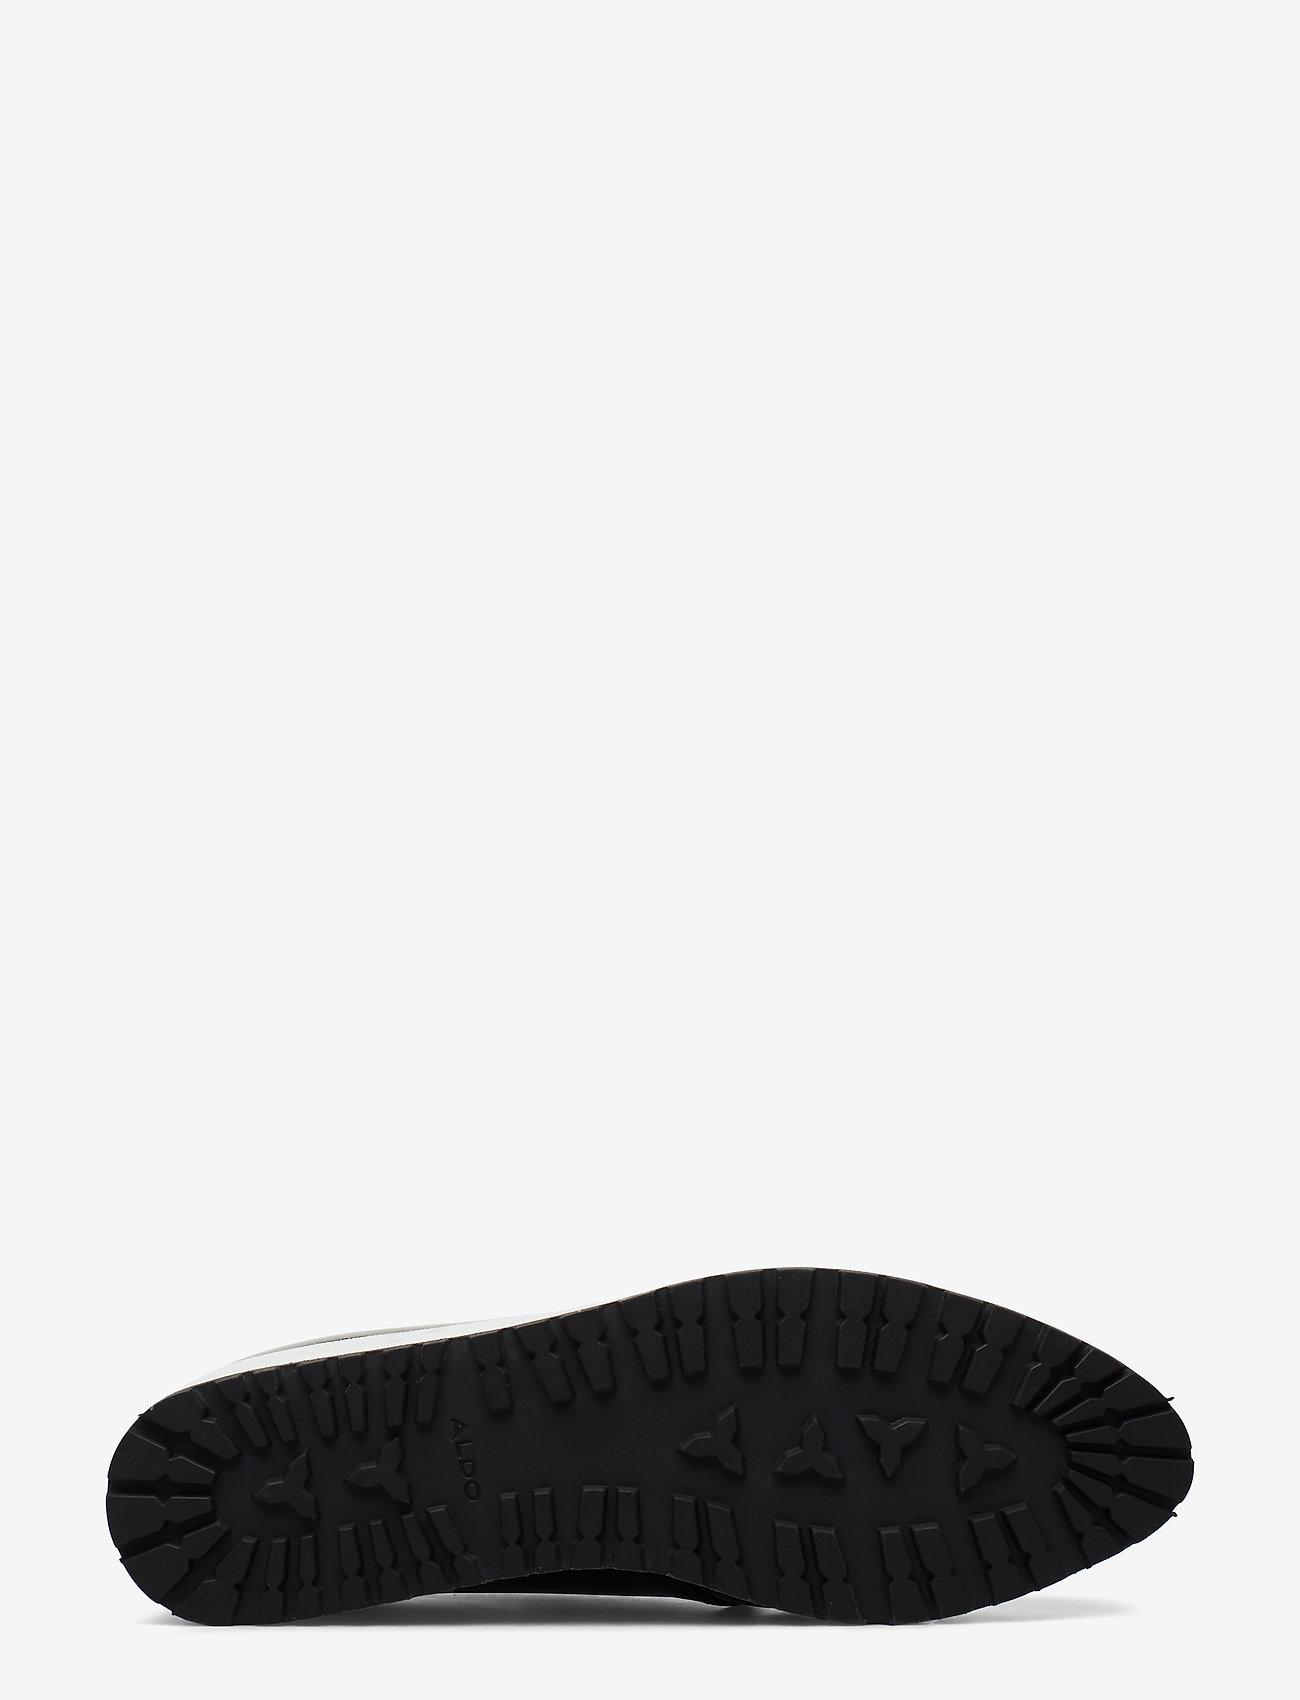 Lovirede (Black/white) (343.85 kr) - Aldo